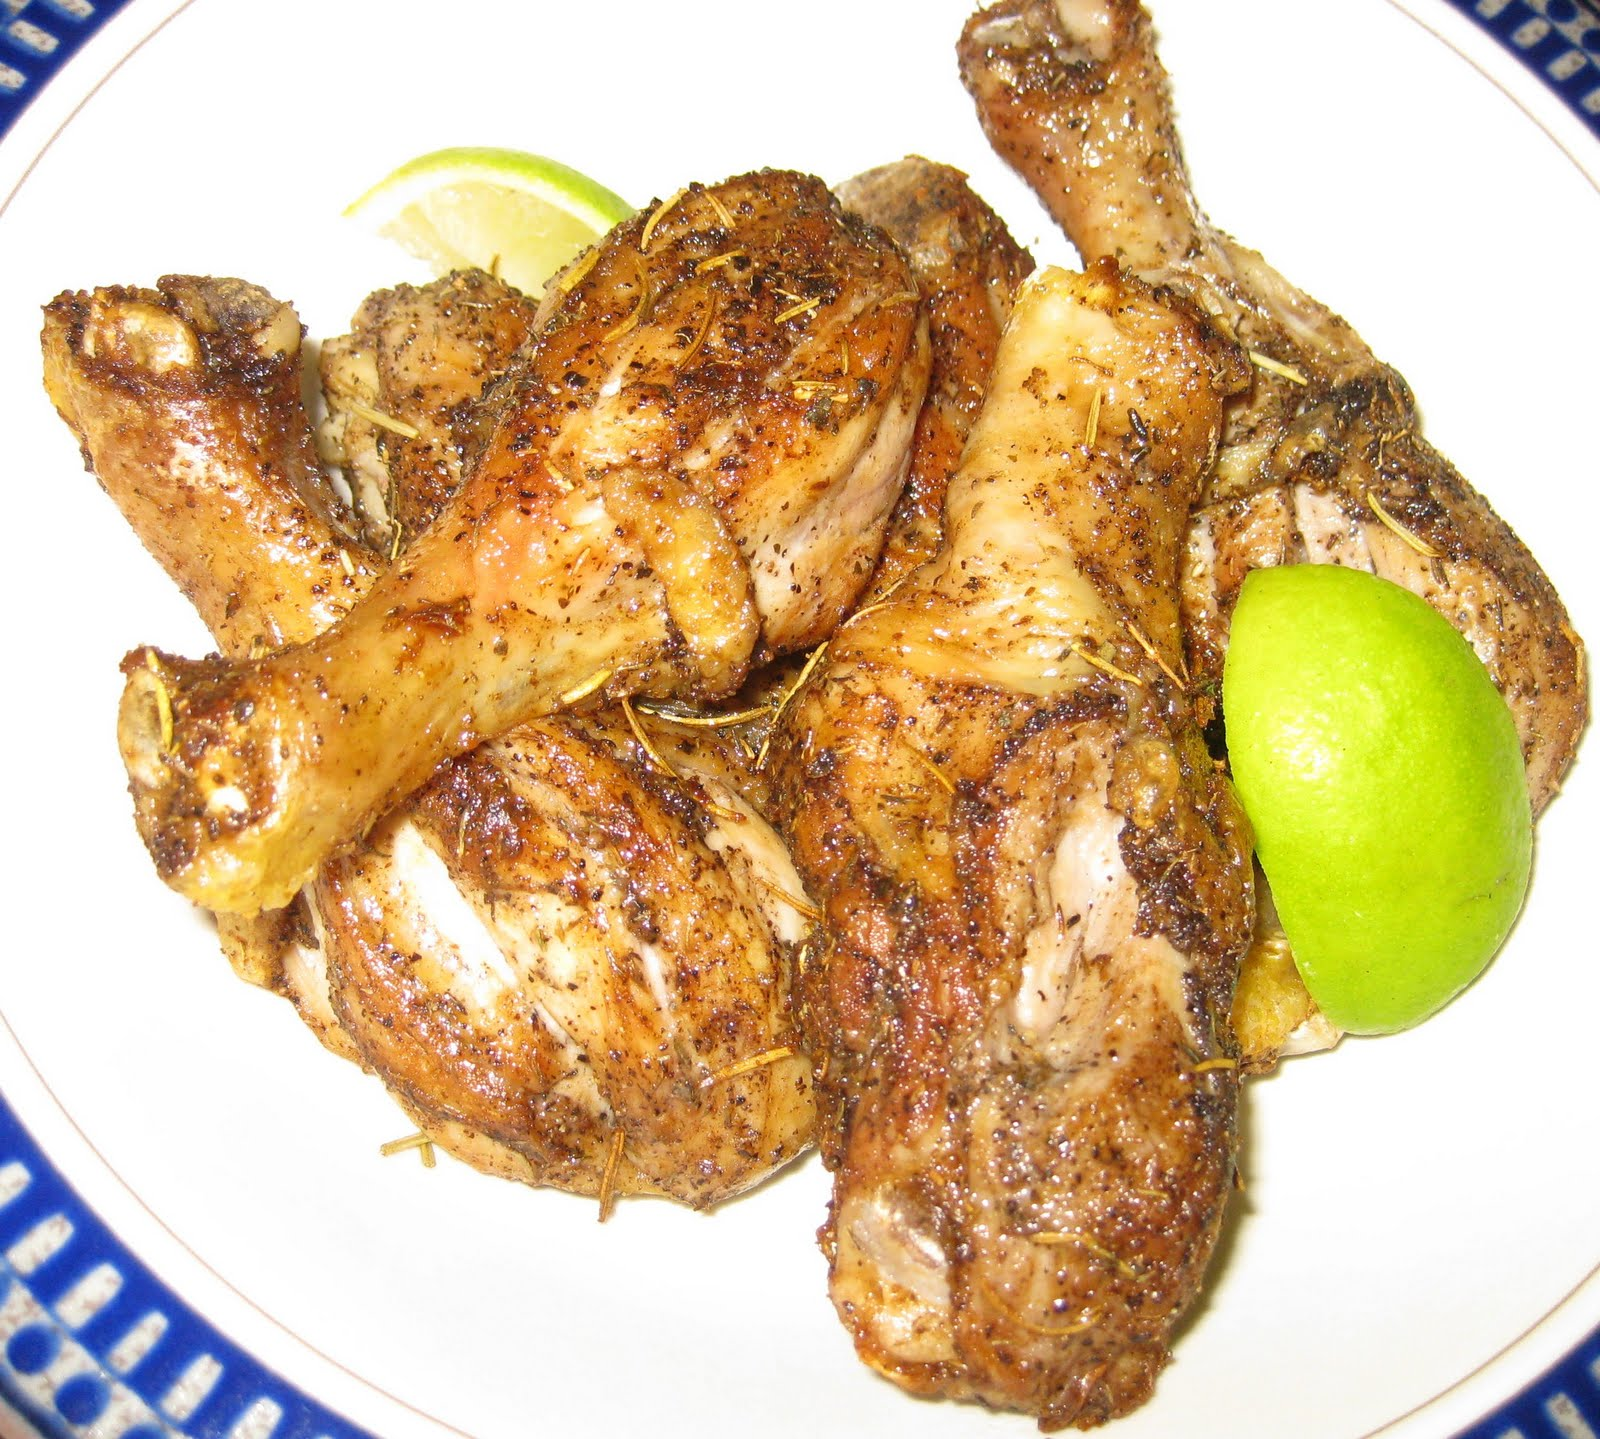 Cheenachatti Pan Seared Chicken Legs